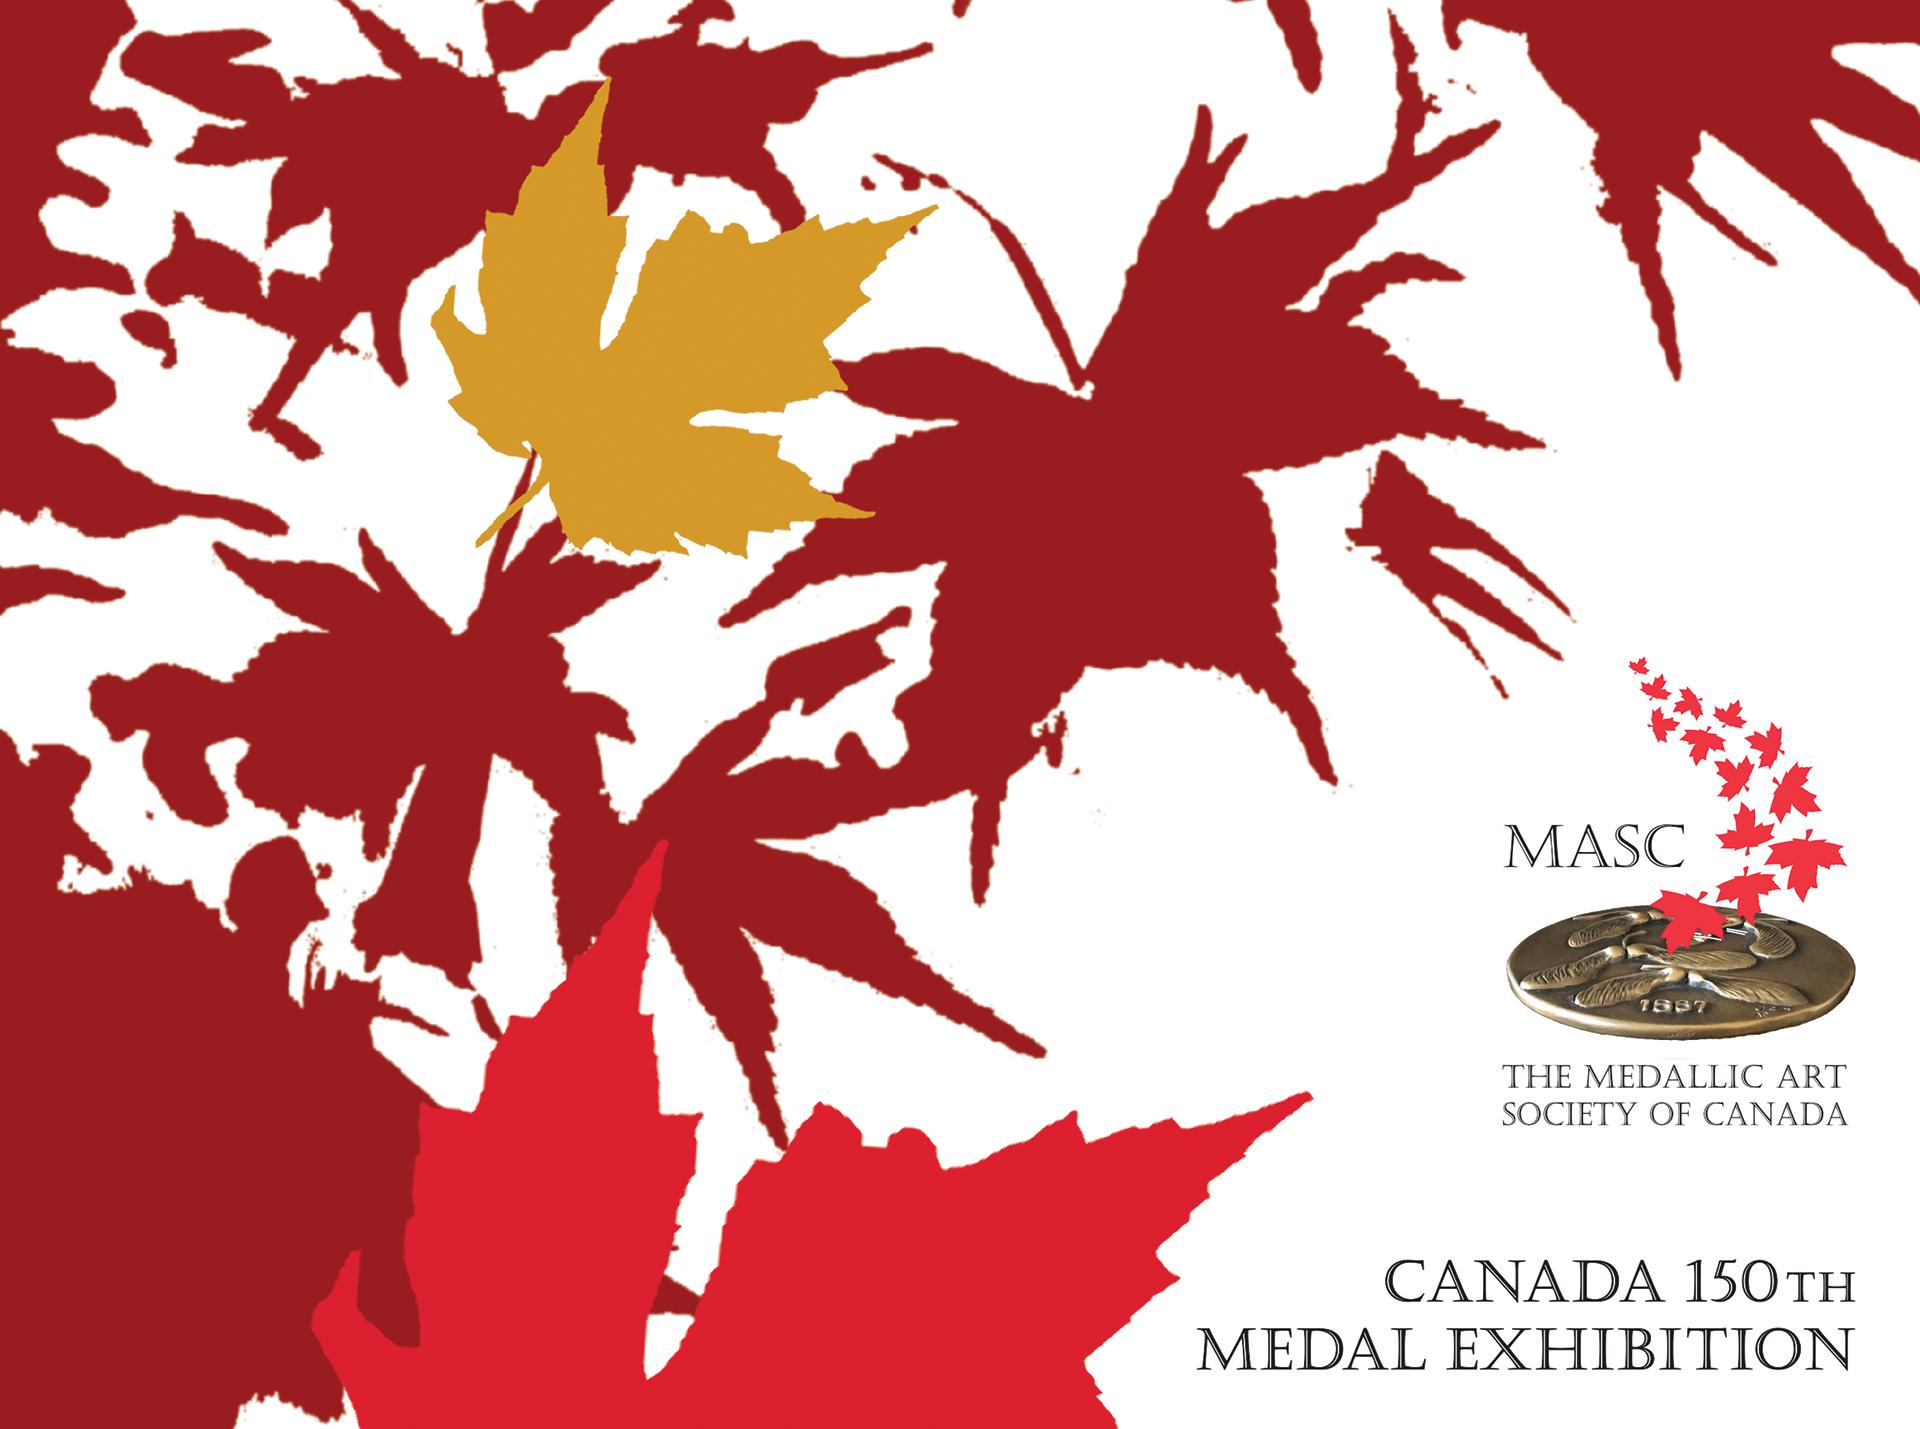 MASC Exhibition Catalogue Cover2.0